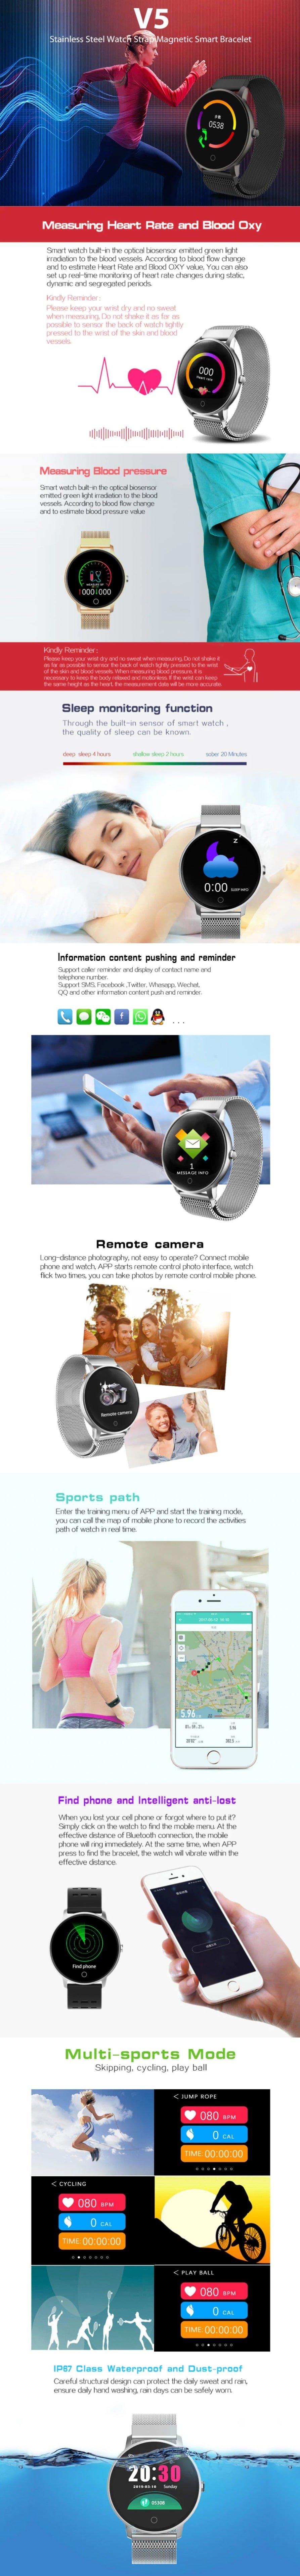 V5 Stainless Steel Watch Strap Magnetic Smart Bracelet black